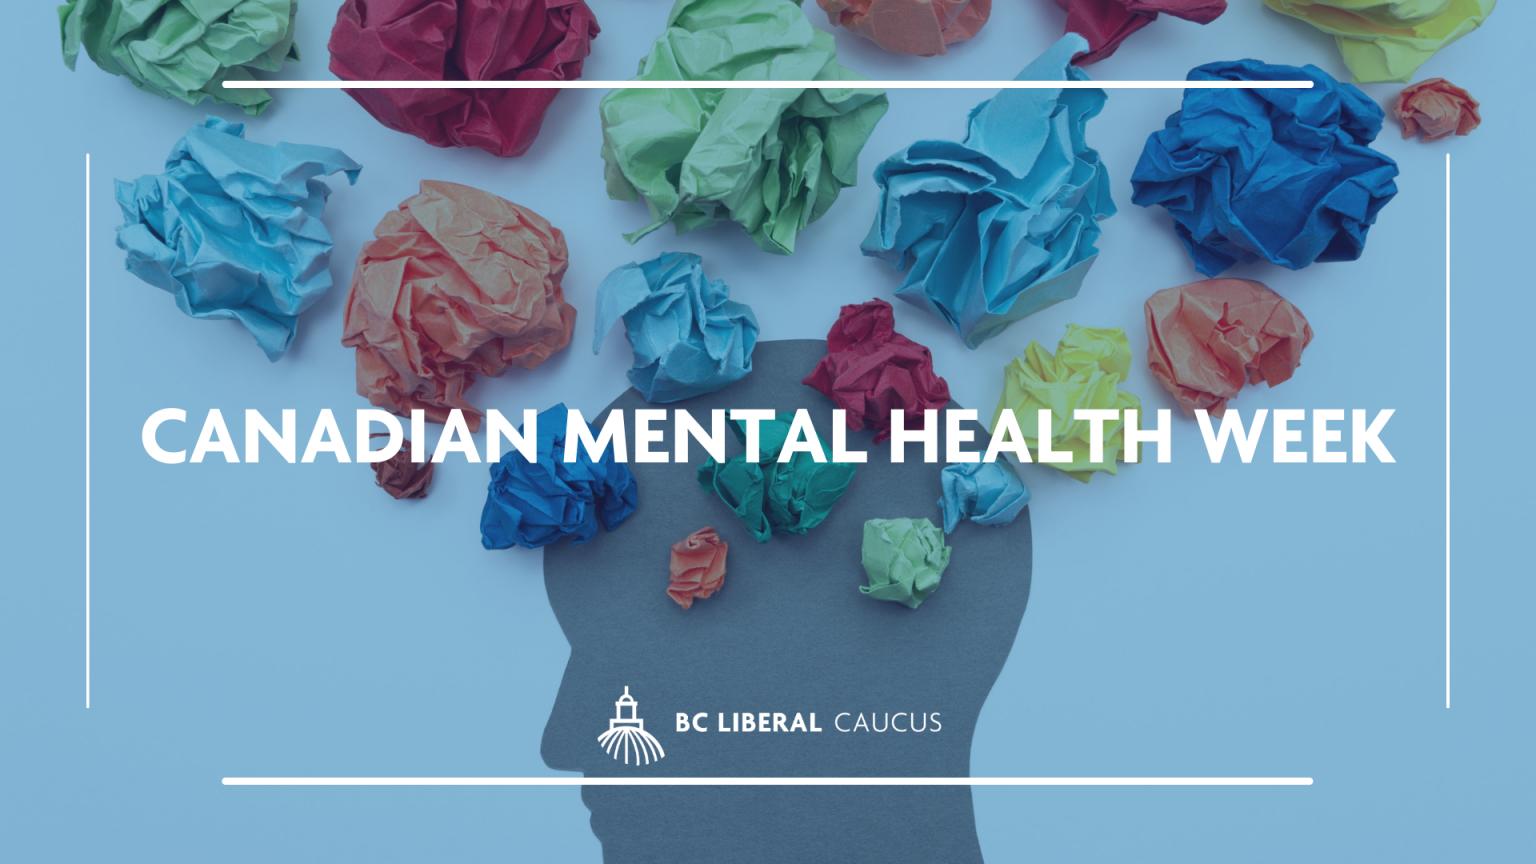 Statement from MLA Trevor Halford on Canadian Mental Health Week